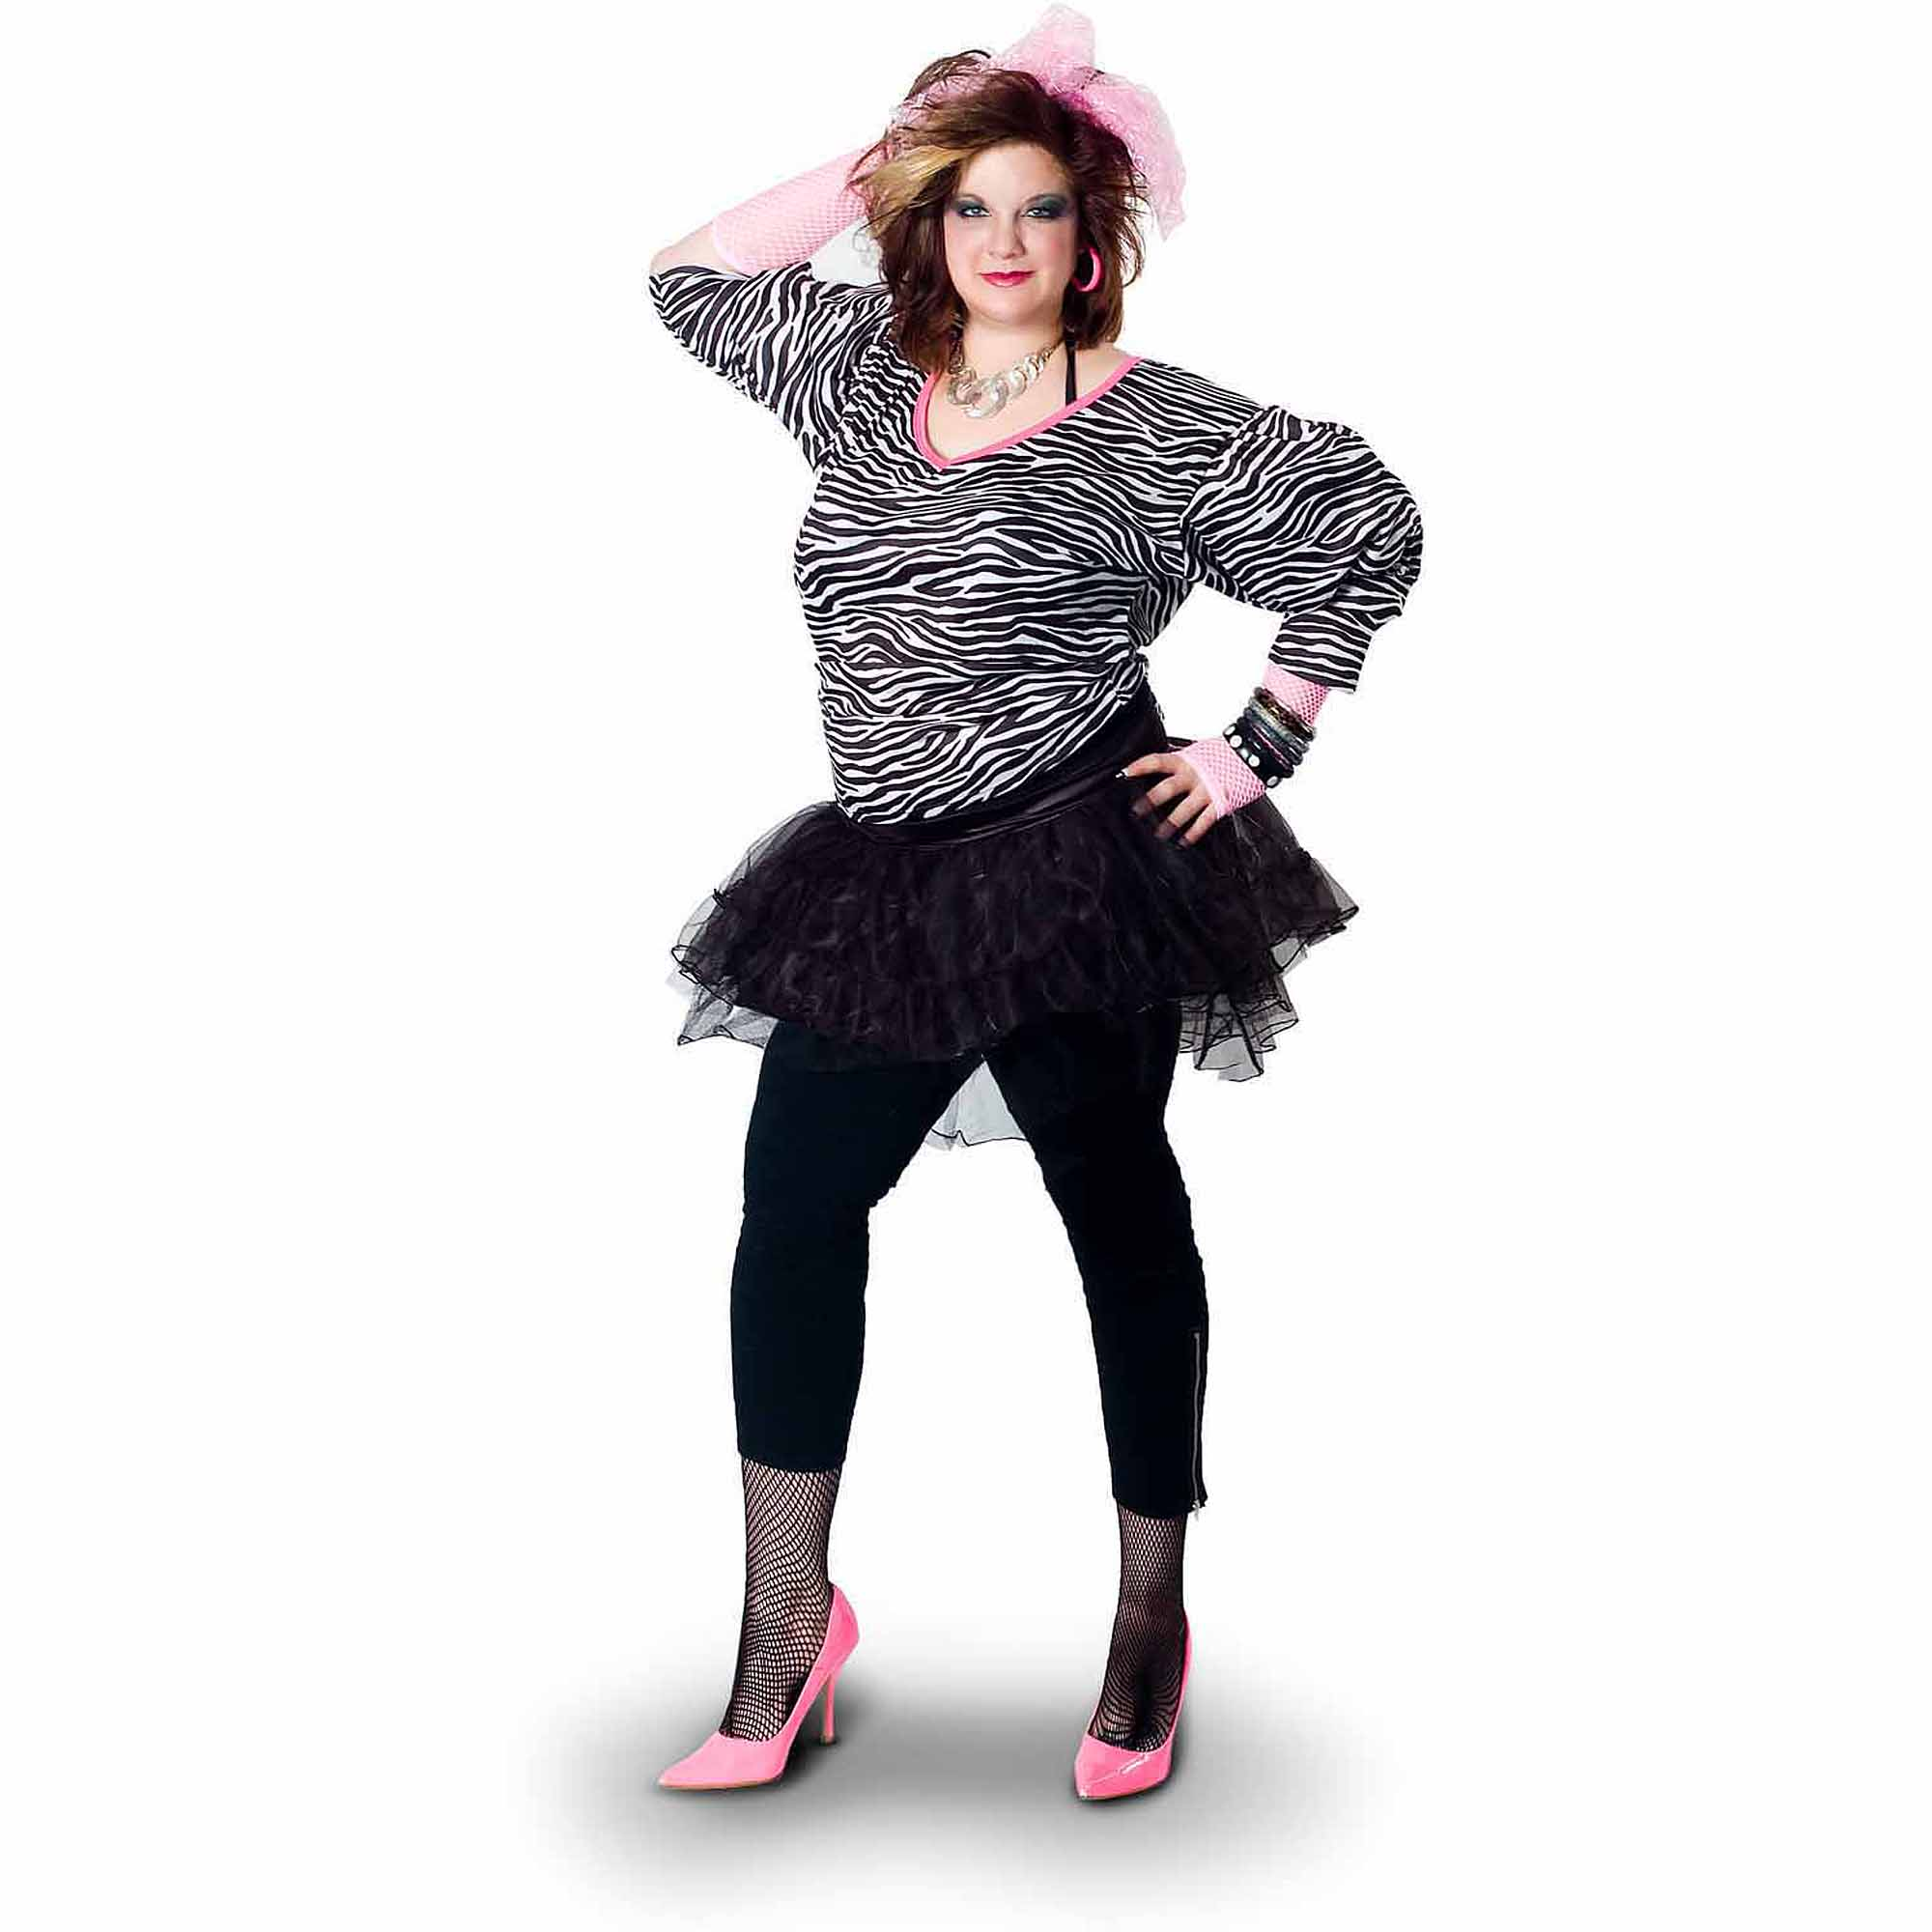 Lava Diva Hip Hop 80u0027s Womenu0027s Plus Size Adult Halloween Costume - Walmart.com  sc 1 st  Walmart & Lava Diva Hip Hop 80u0027s Womenu0027s Plus Size Adult Halloween Costume ...